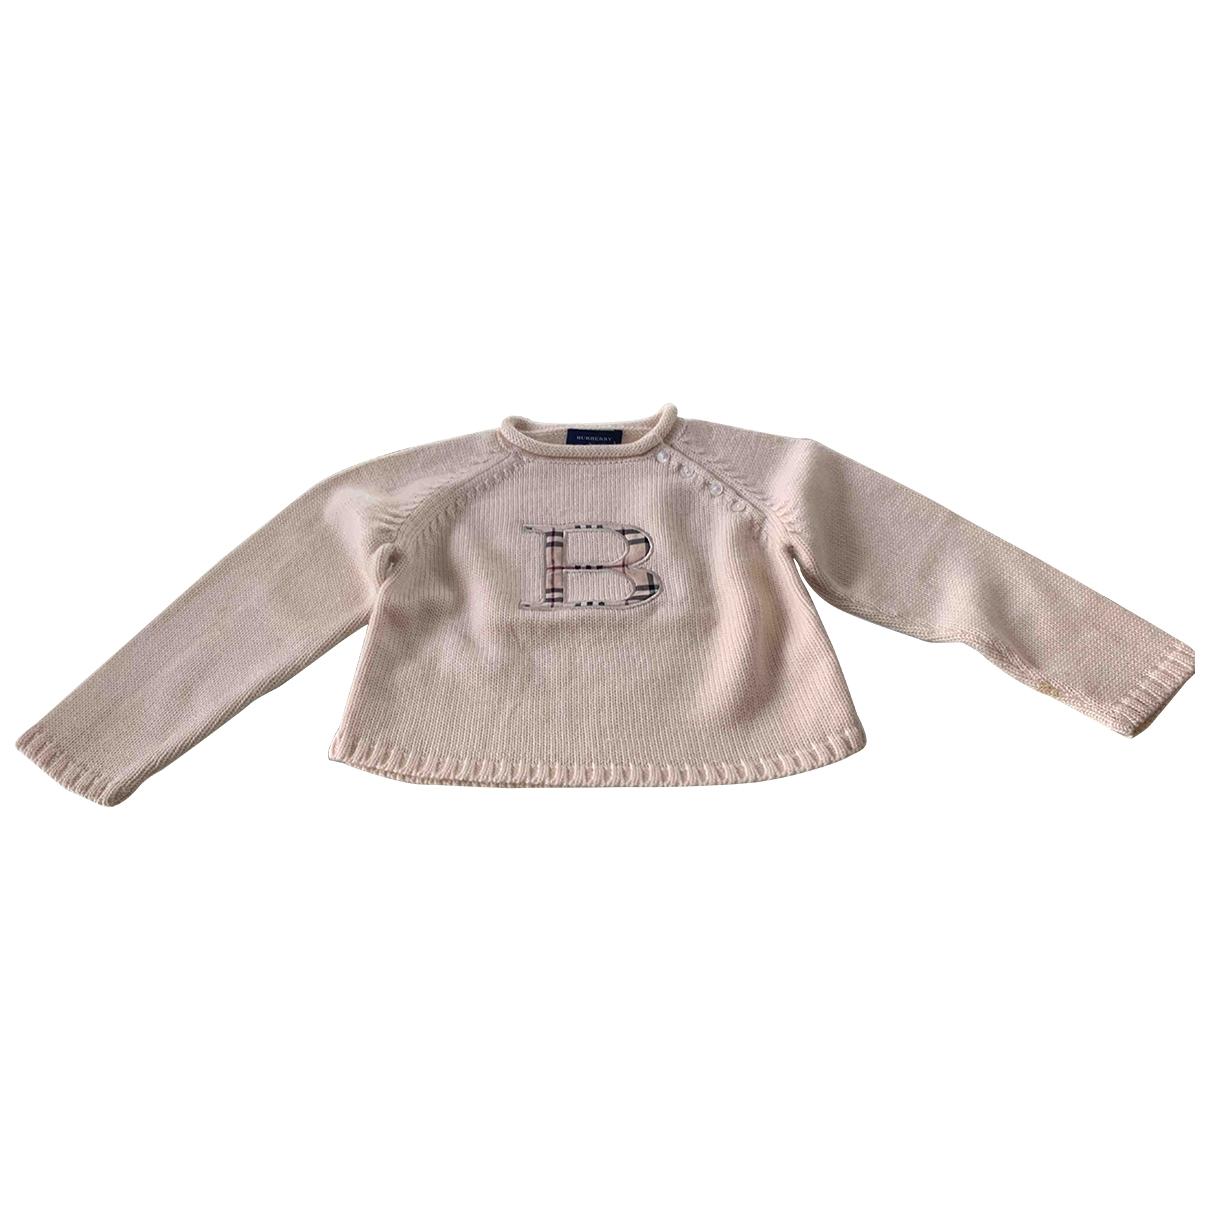 Burberry \N Pullover, StrickJacke in  Beige Wolle